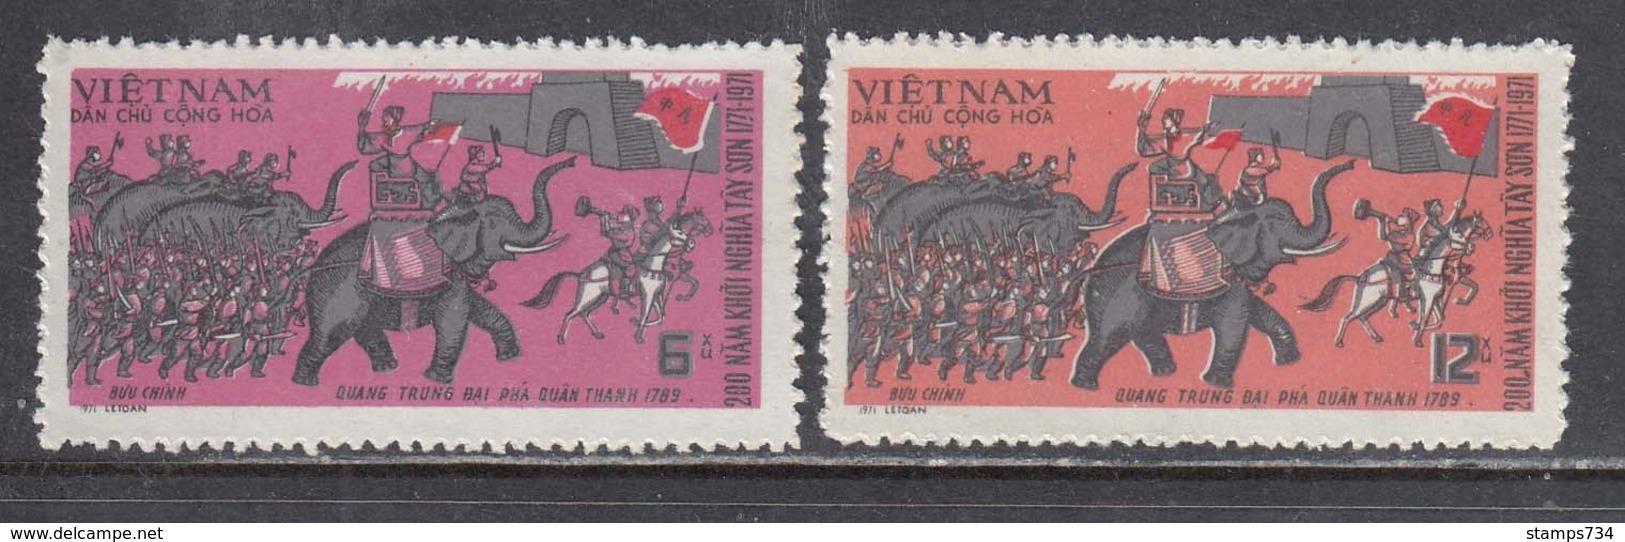 Vietnam Nord 1971 - 200th Anniversary Of The Uprising Of Tay Son, Mi-Nr. 655/56, MNH** - Vietnam